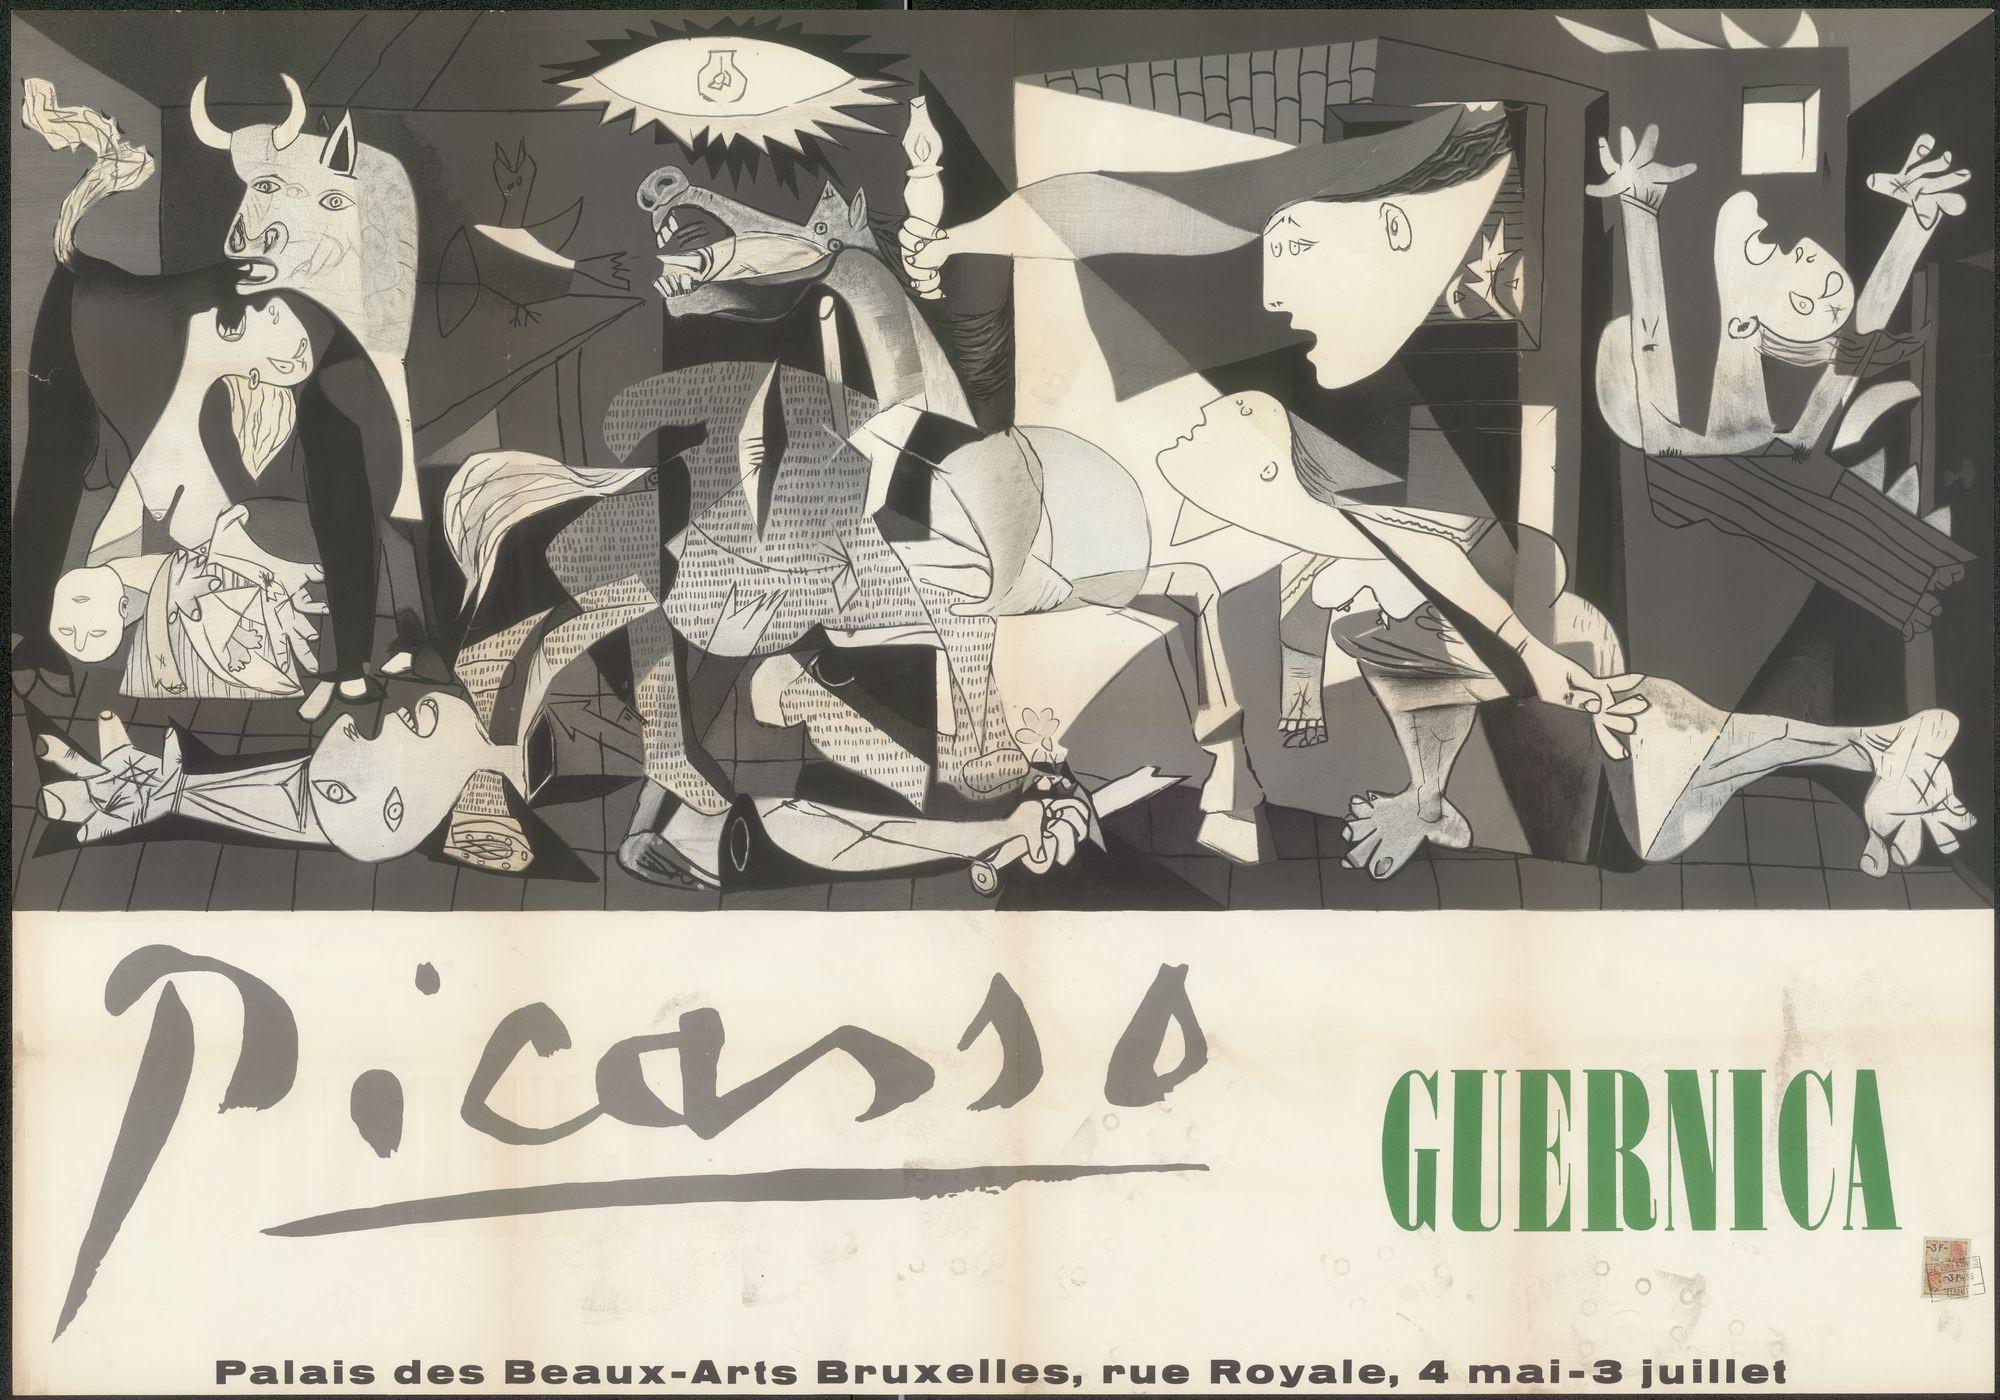 Tentoonstelling Picasso Guernica, Palais des Beaux-Arts (Paleis voor Schone Kunsten), Brussel, 4 mei - 3 juli 1956